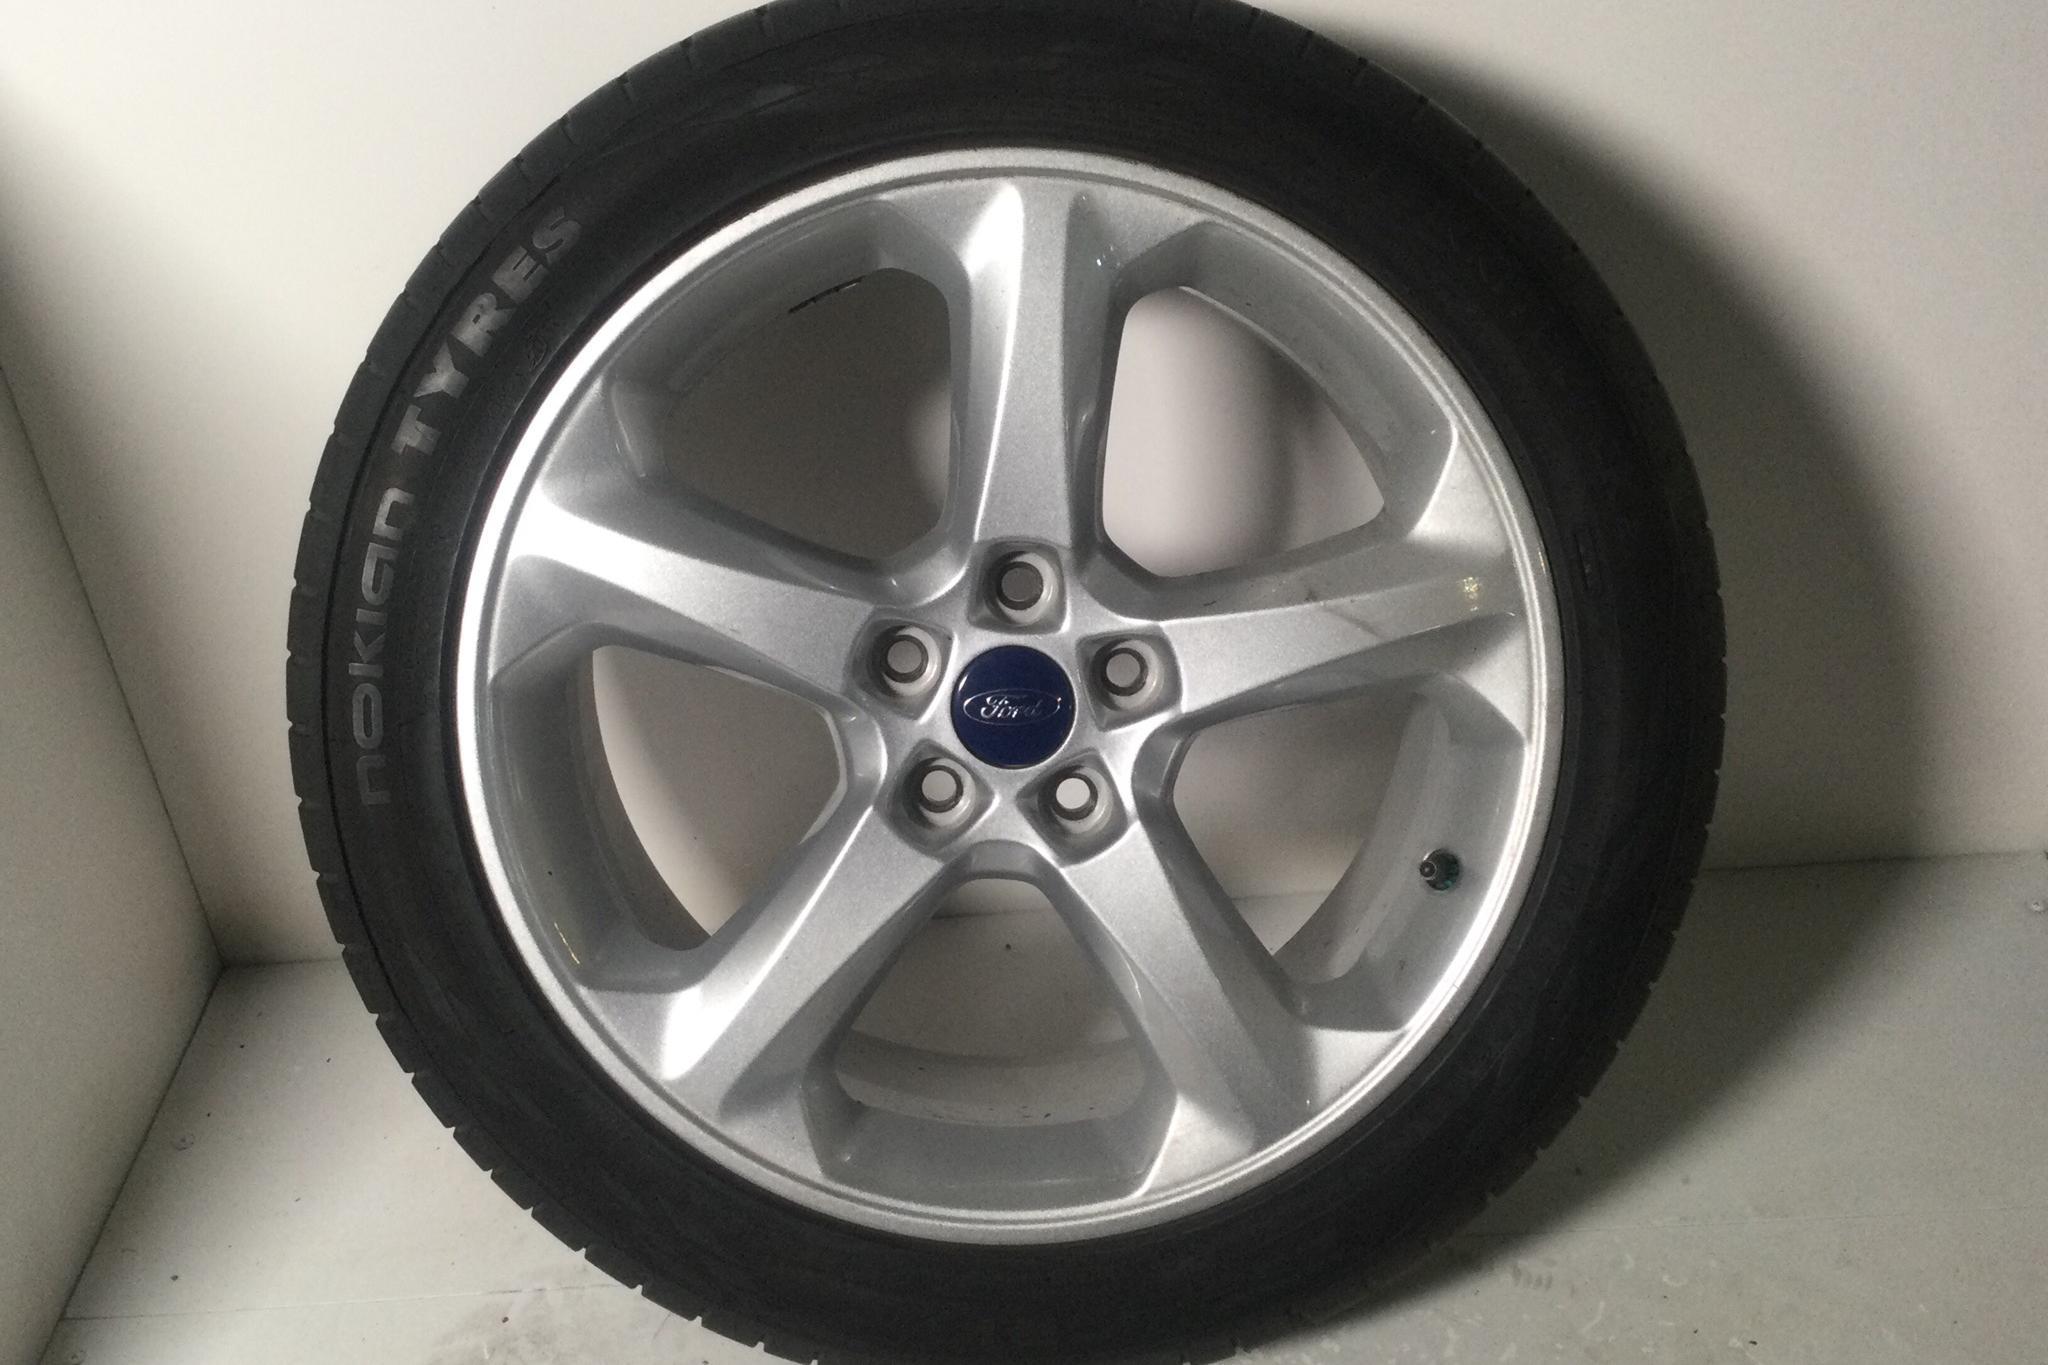 Ford Mondeo 2.0 TDCi Kombi (180hk) - 9 576 mil - Automat - svart - 2016